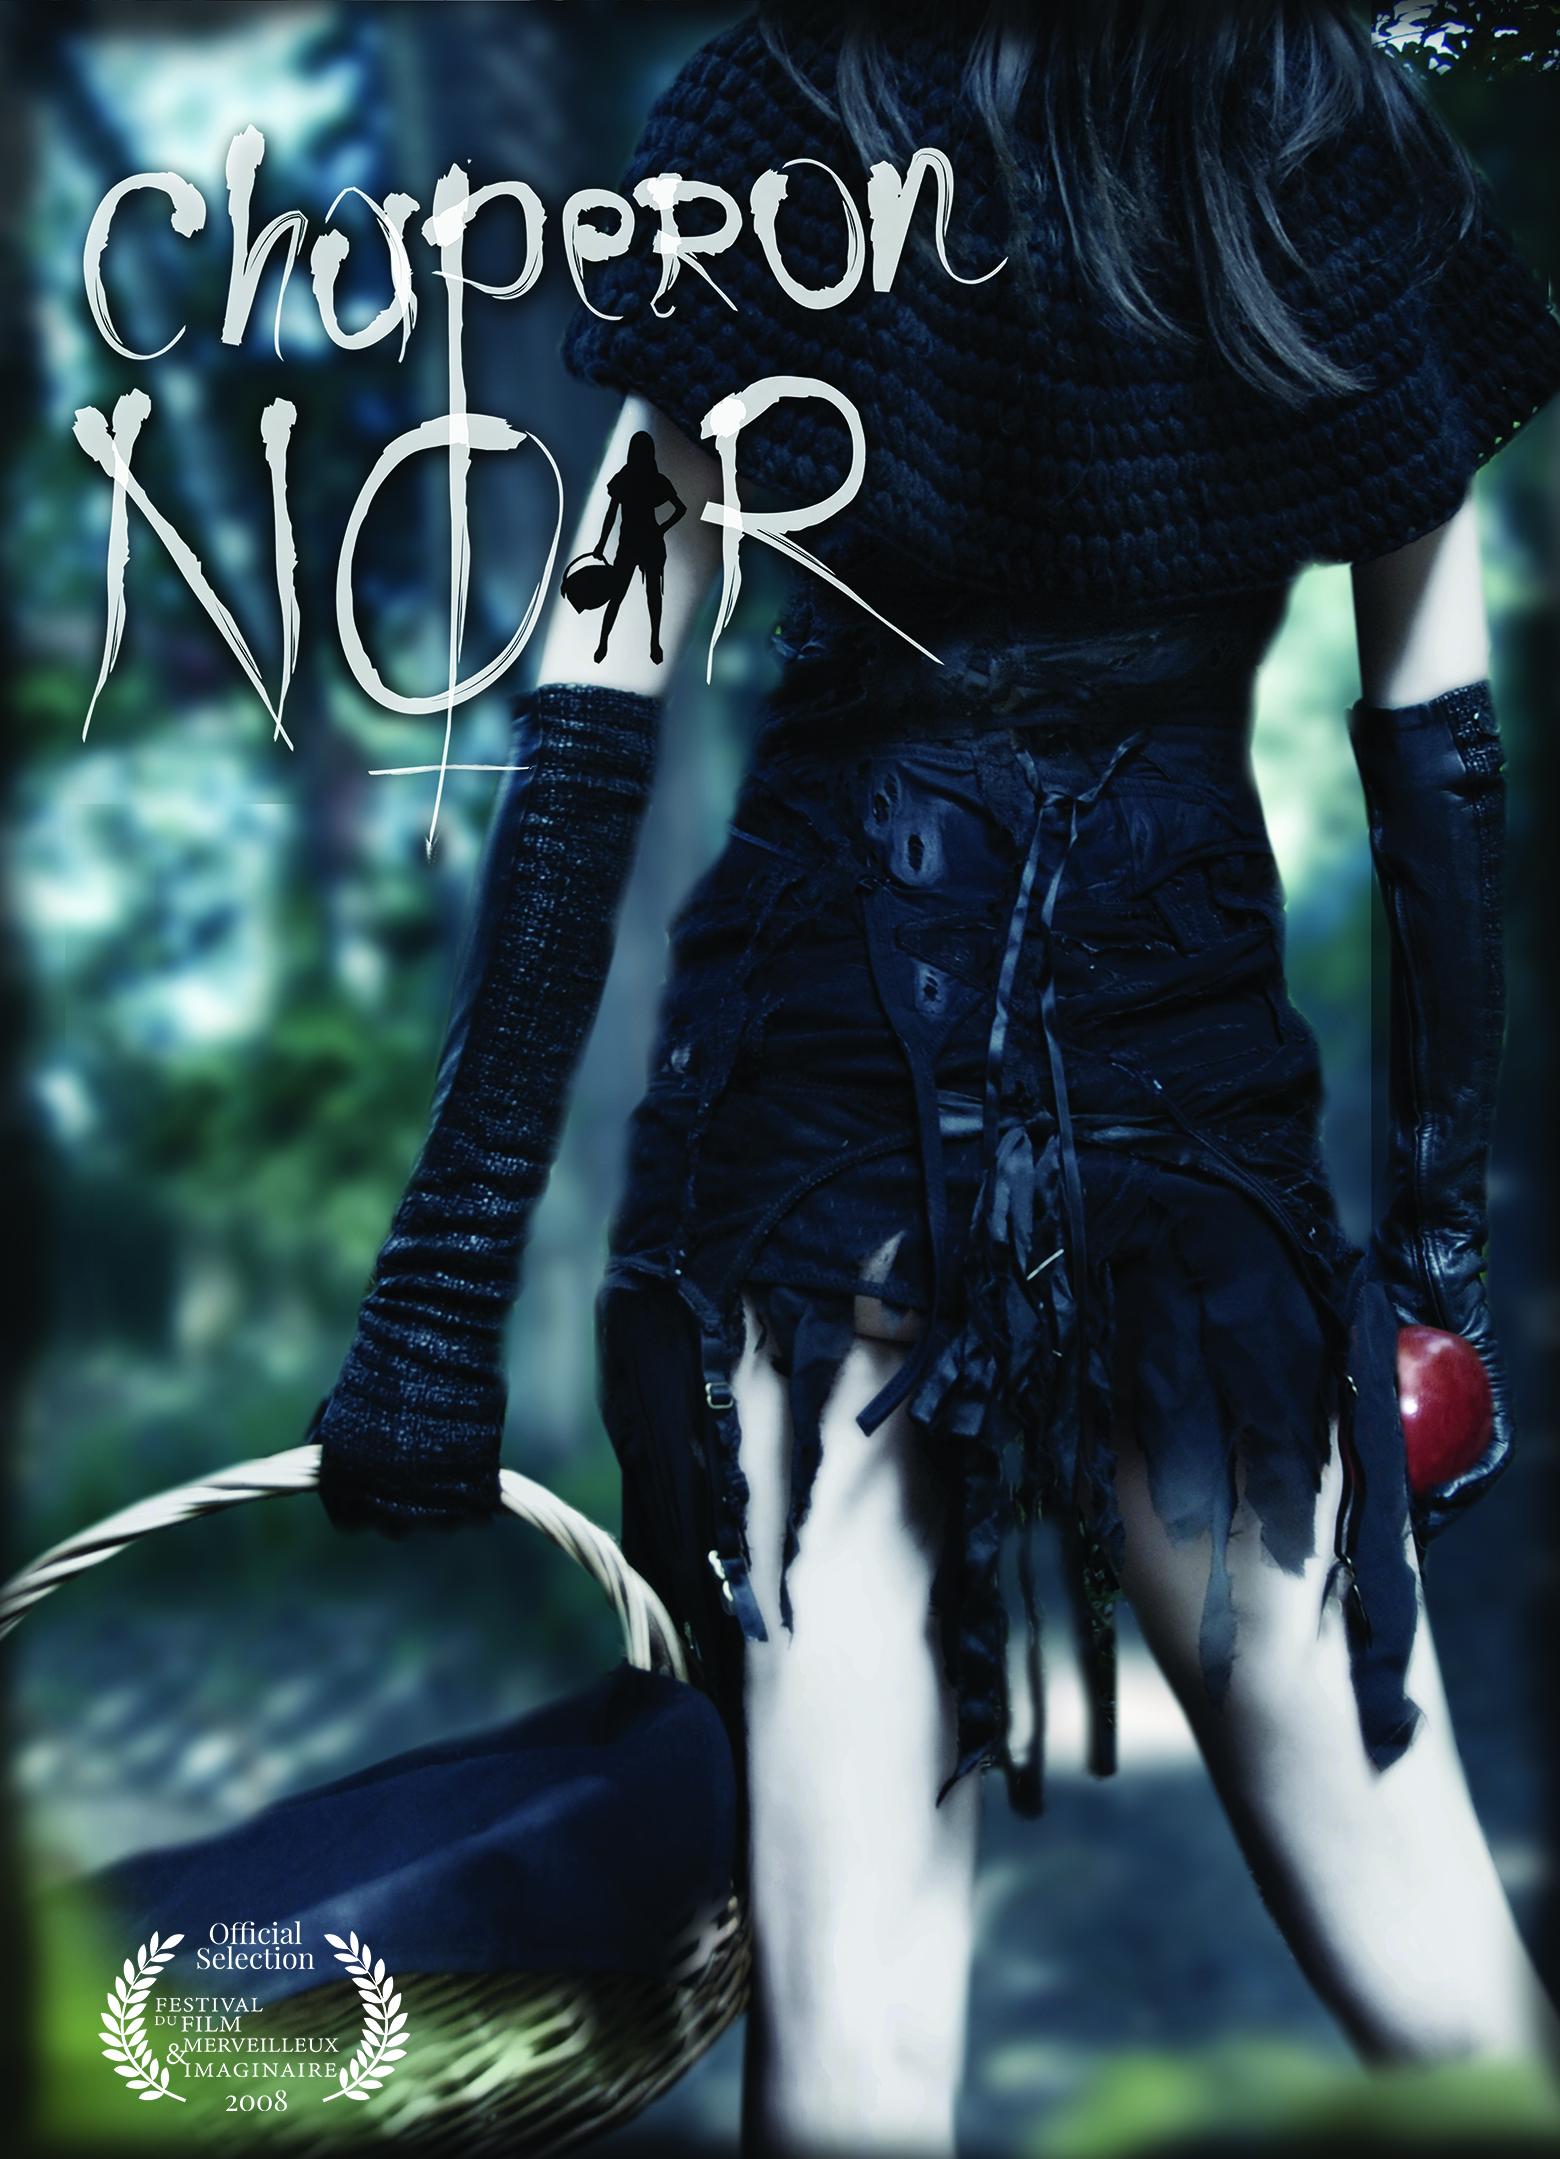 1-Chaperon-Noir-Still-Poster